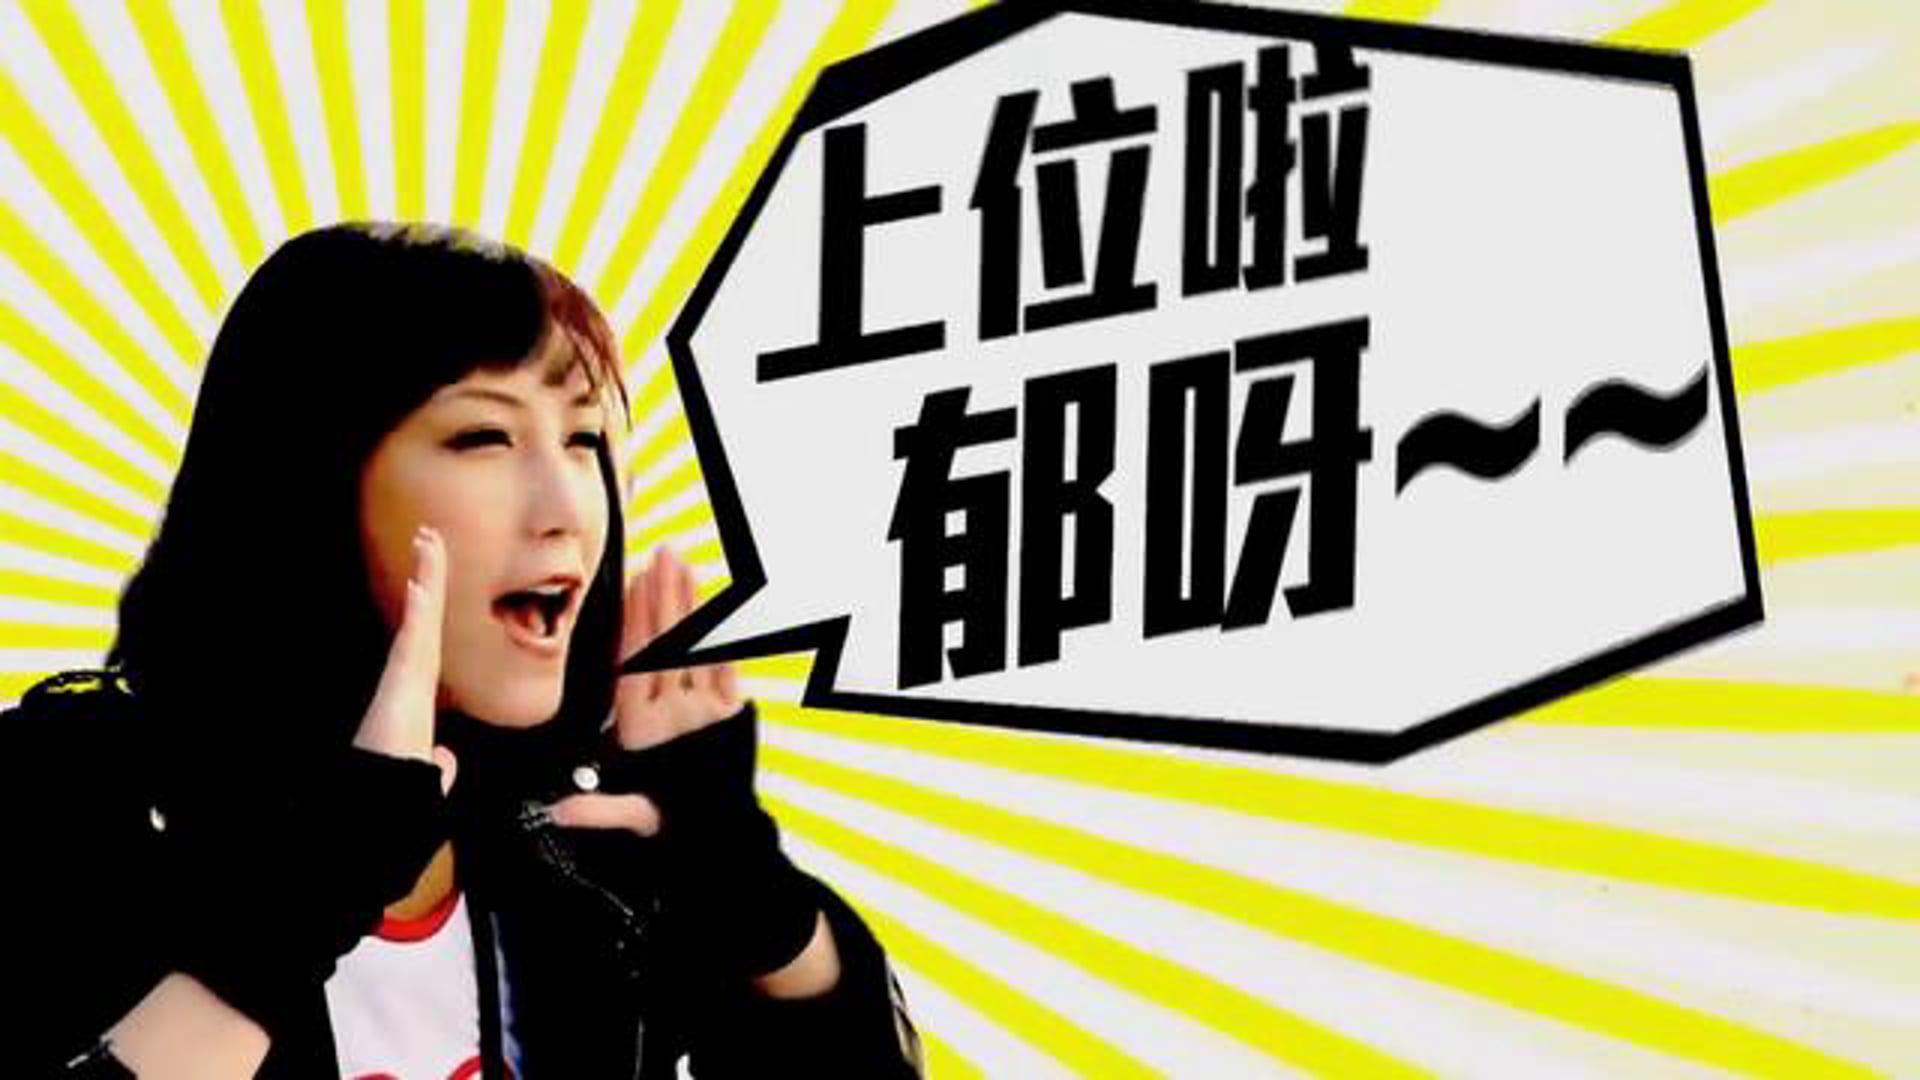 大聲女系列-撻車篇 from The-OneMovie.com